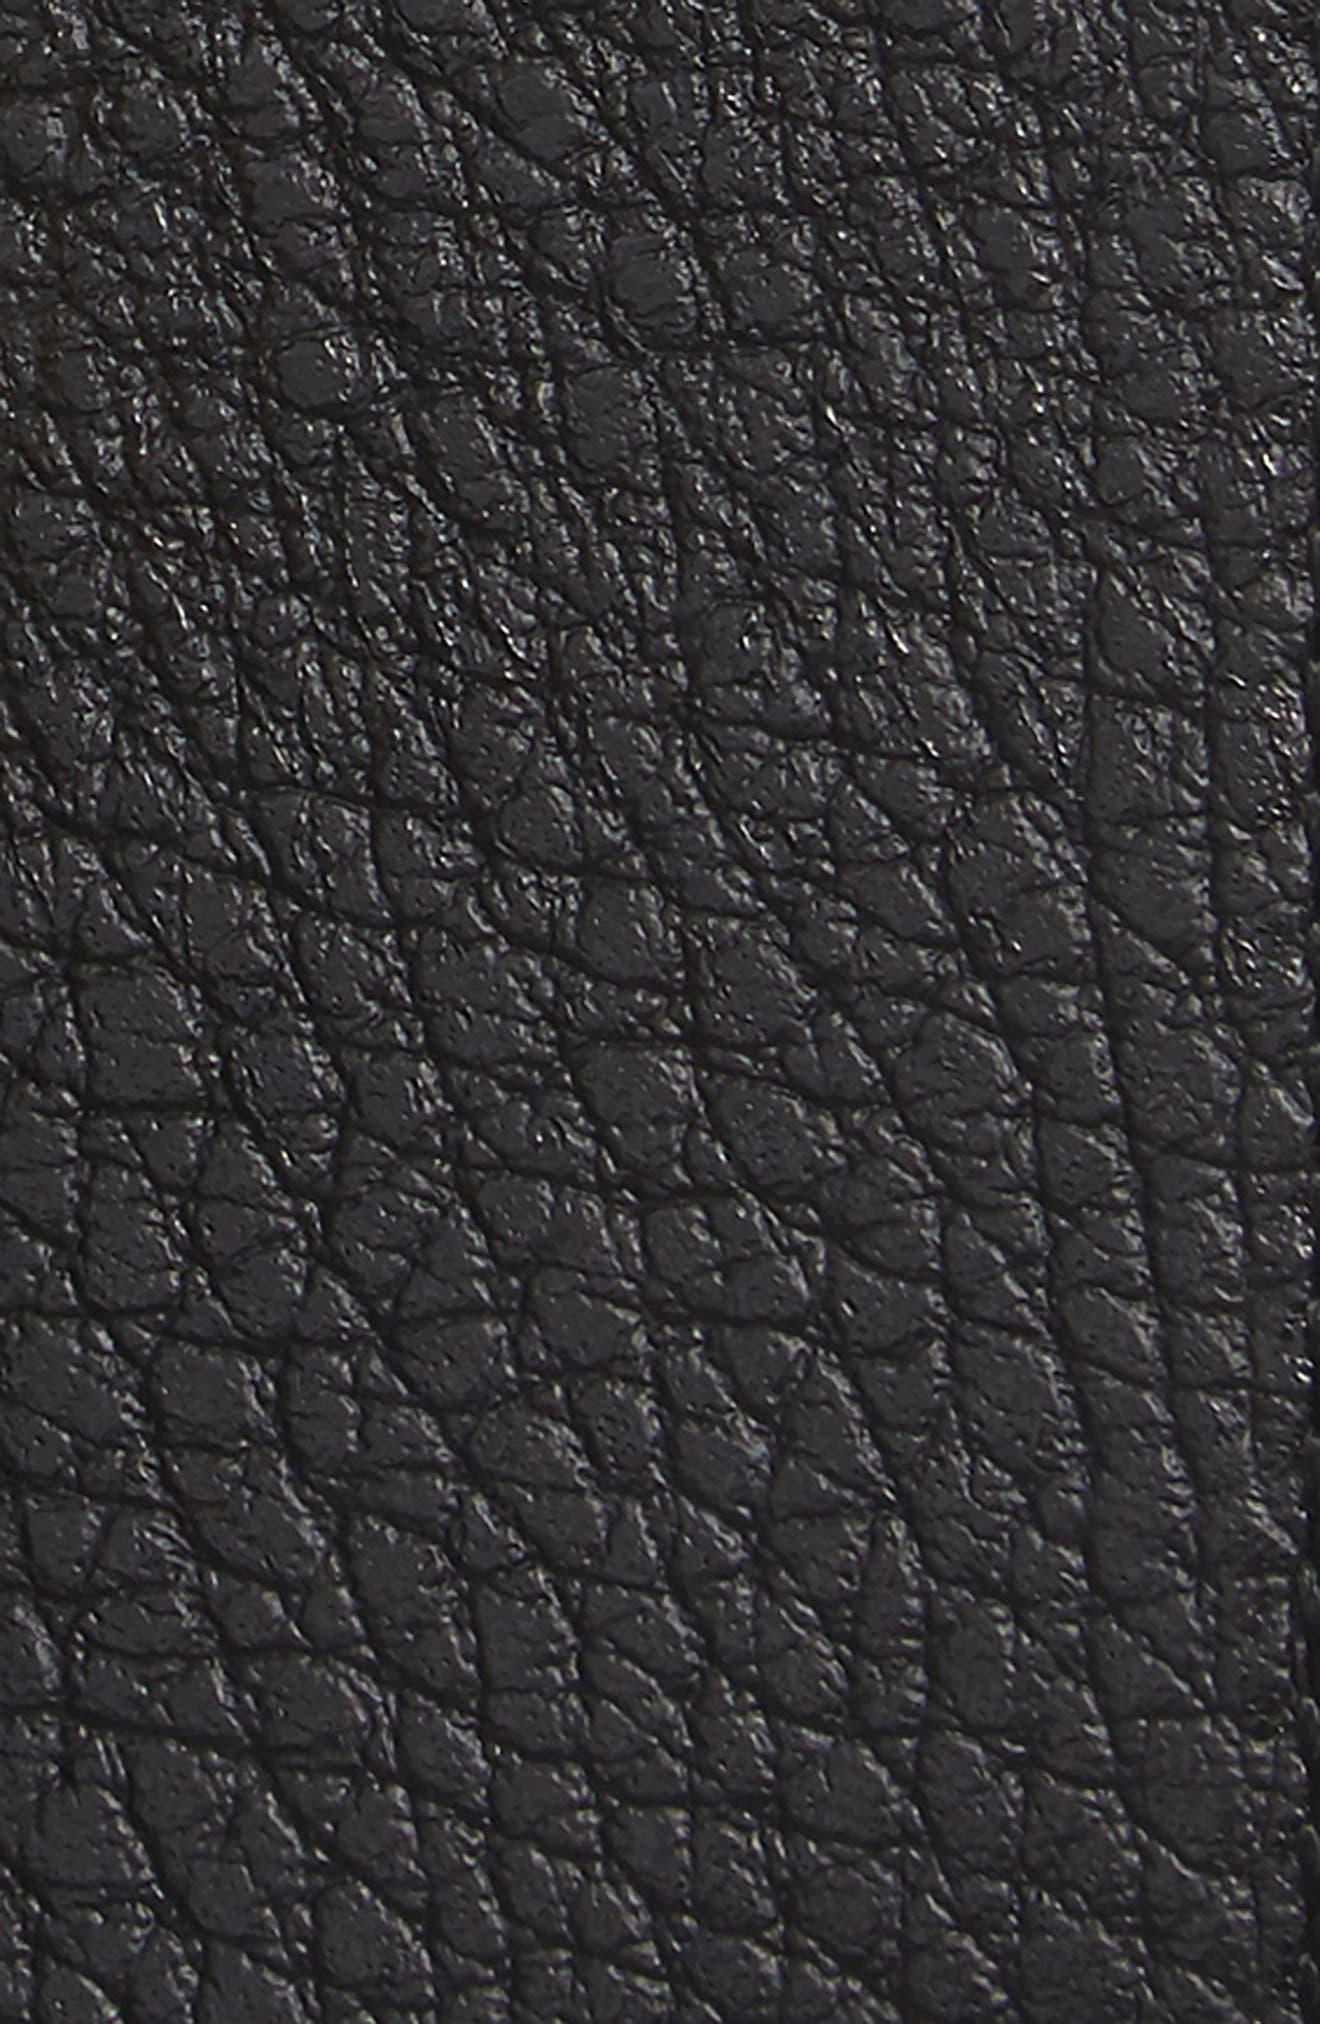 GG Marmont Reversible Leather Belt,                             Alternate thumbnail 3, color,                             241